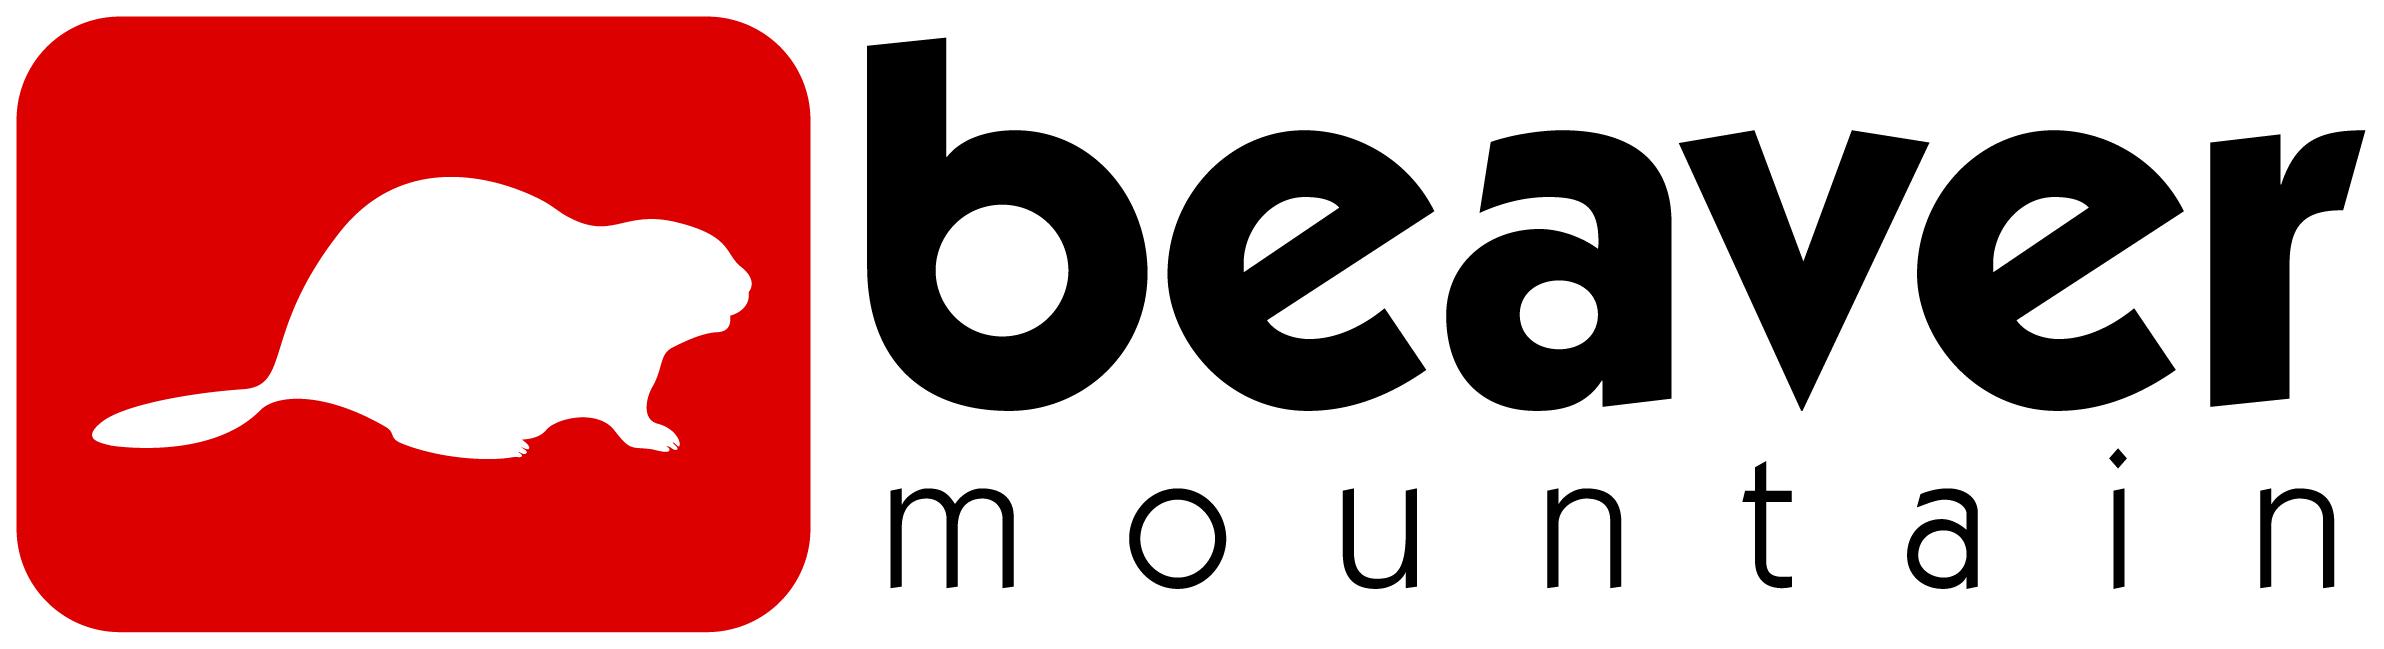 Book The Beav